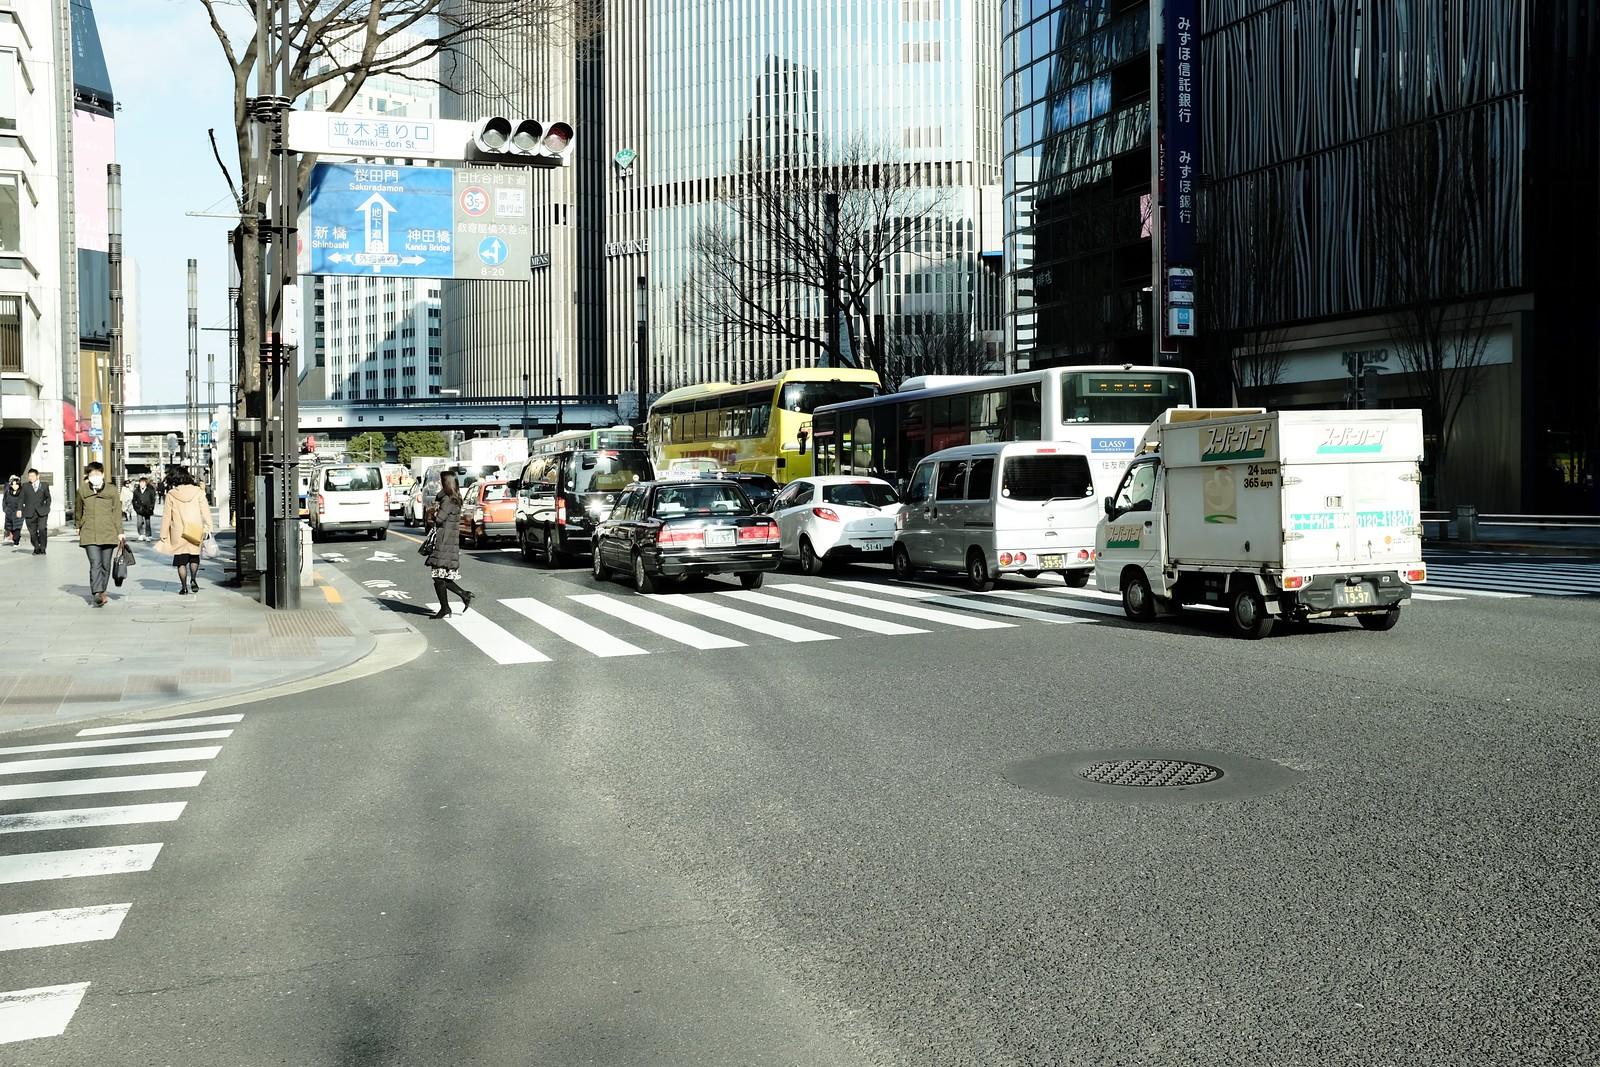 The Ginza taken by FUJIFILM X100S